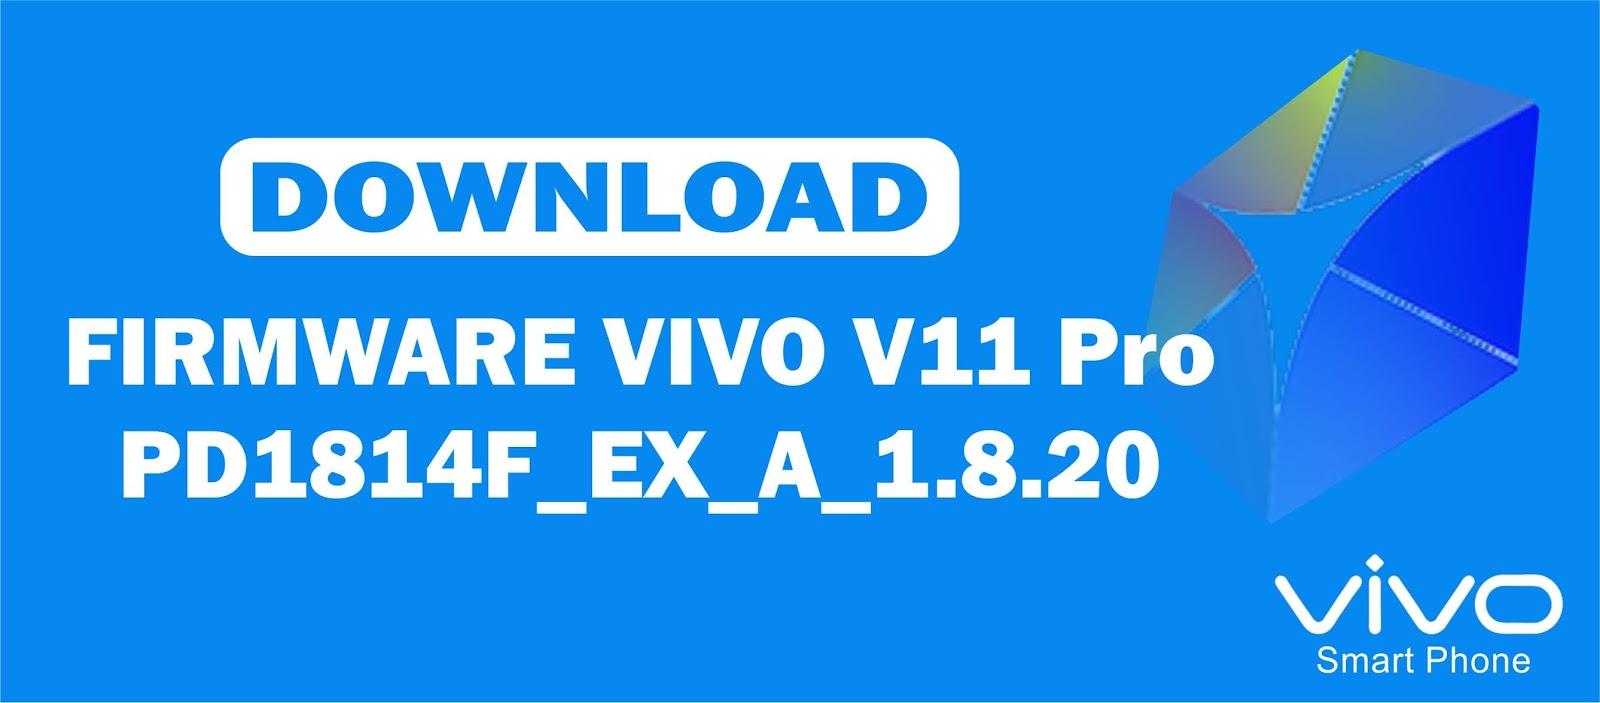 Download Firmware Vivo V11 Pro PD1814F_EX_A_1 8 20 - Repairs